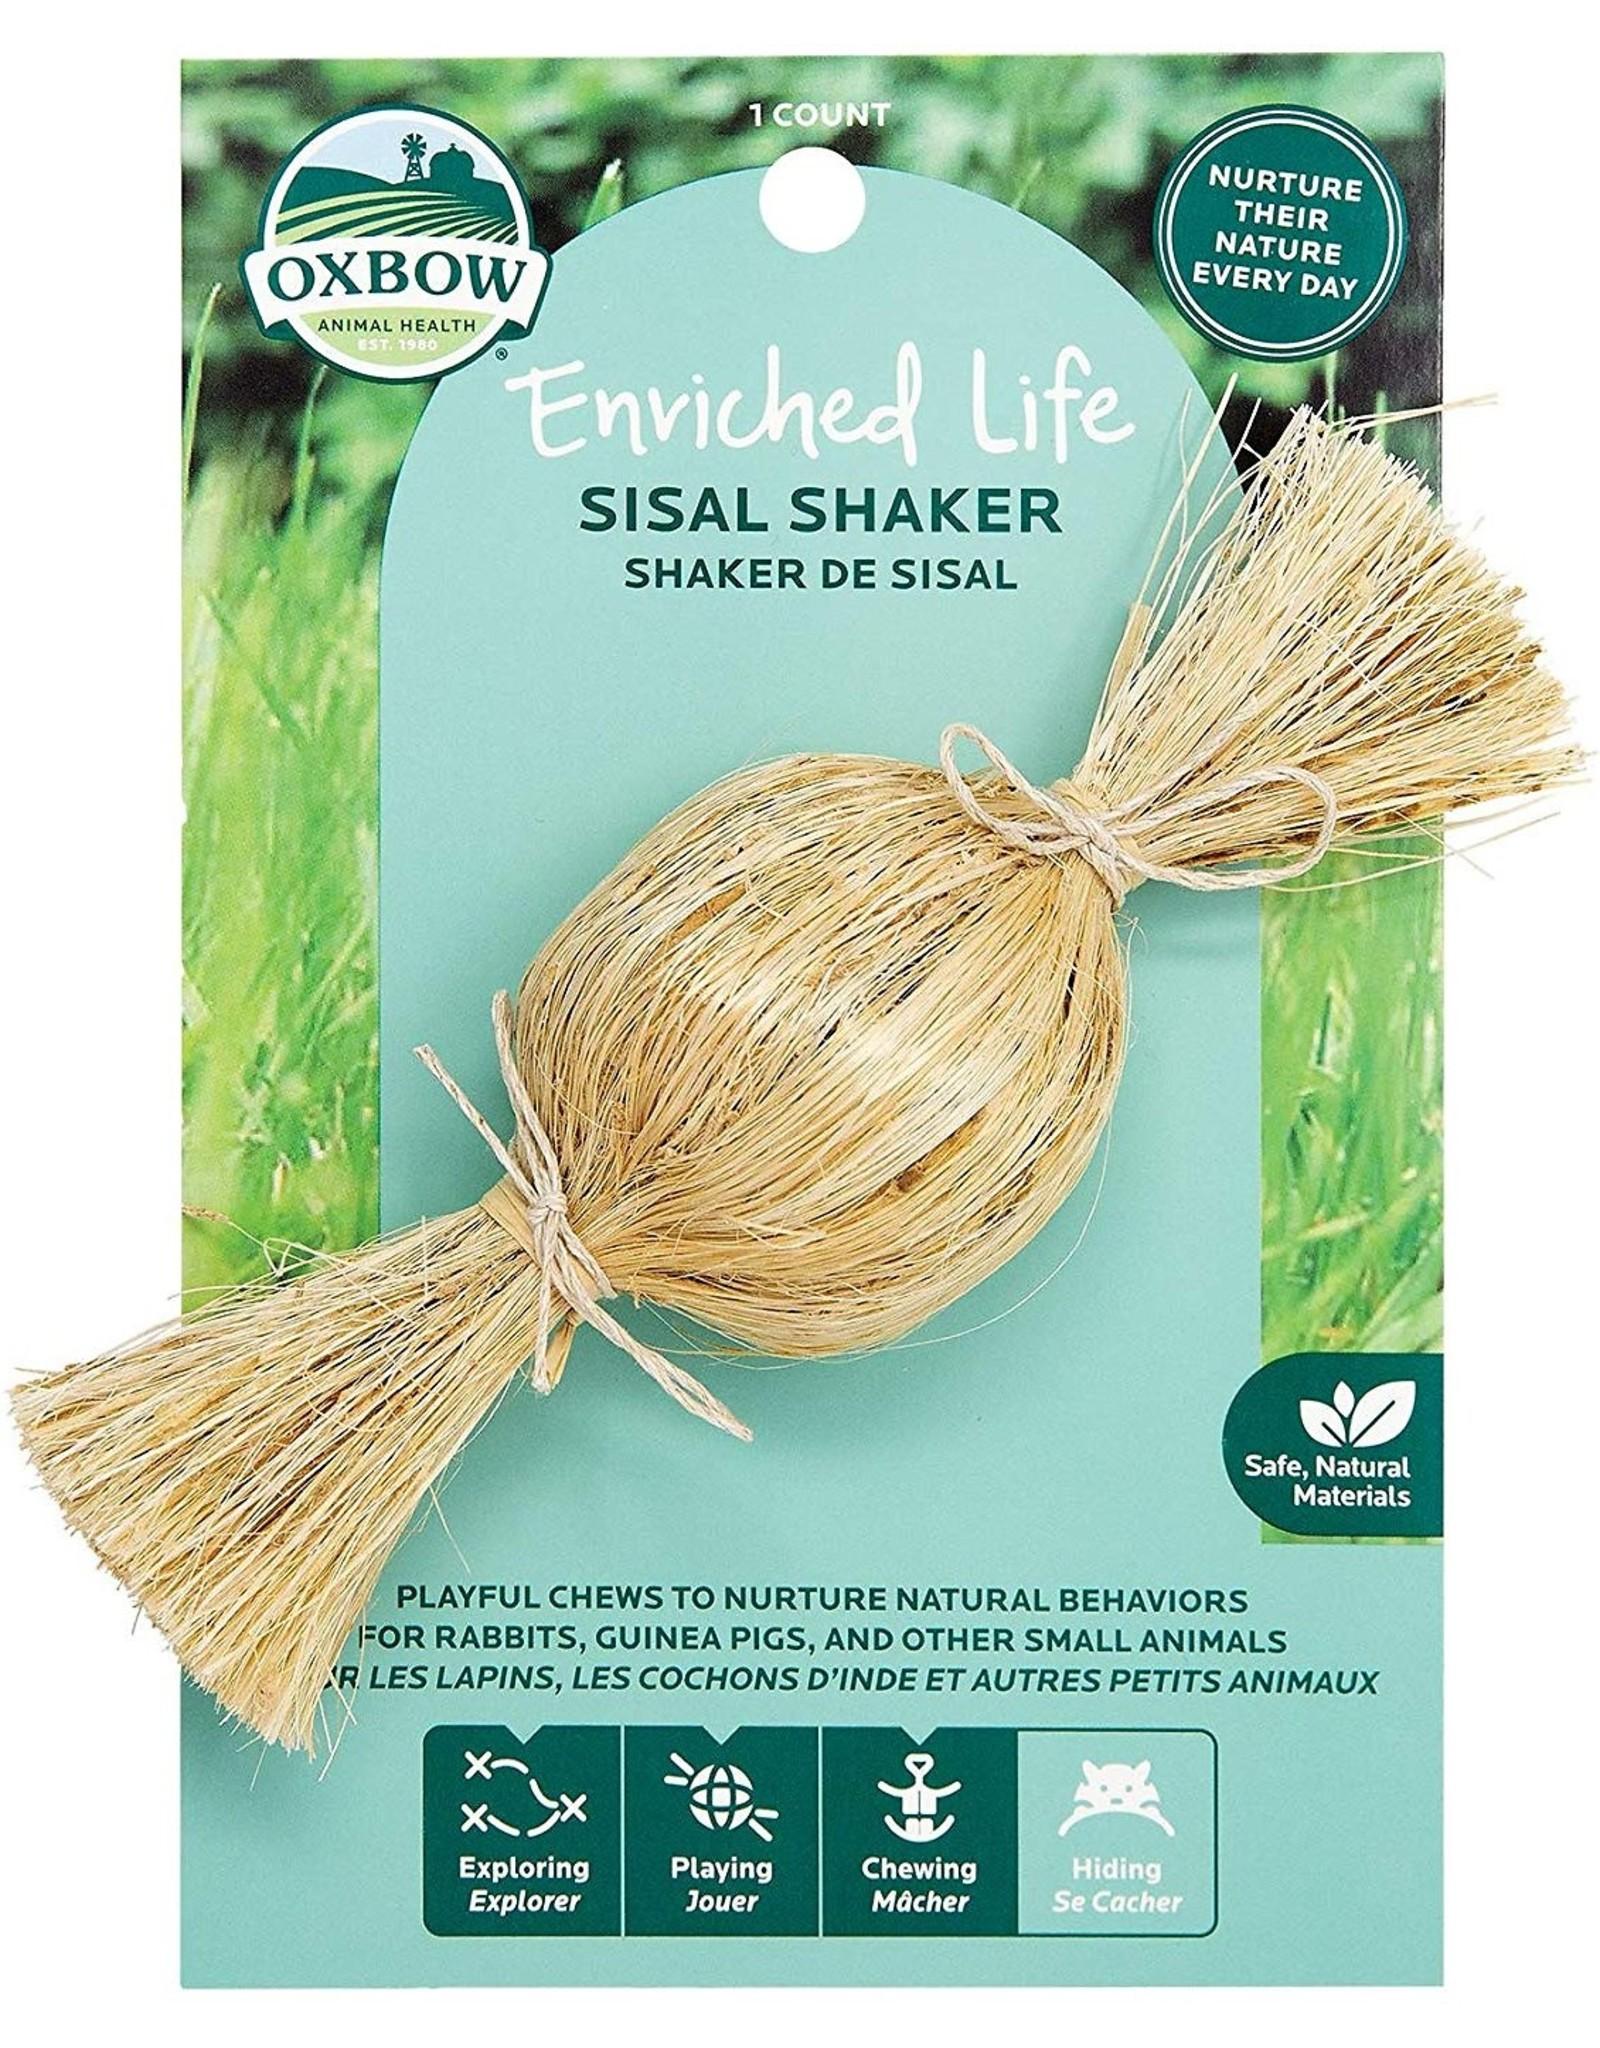 Oxbow Animal Health OXBOW ENRICHED LIFE SISAL SHAKER SMALL ANIMAL TOY